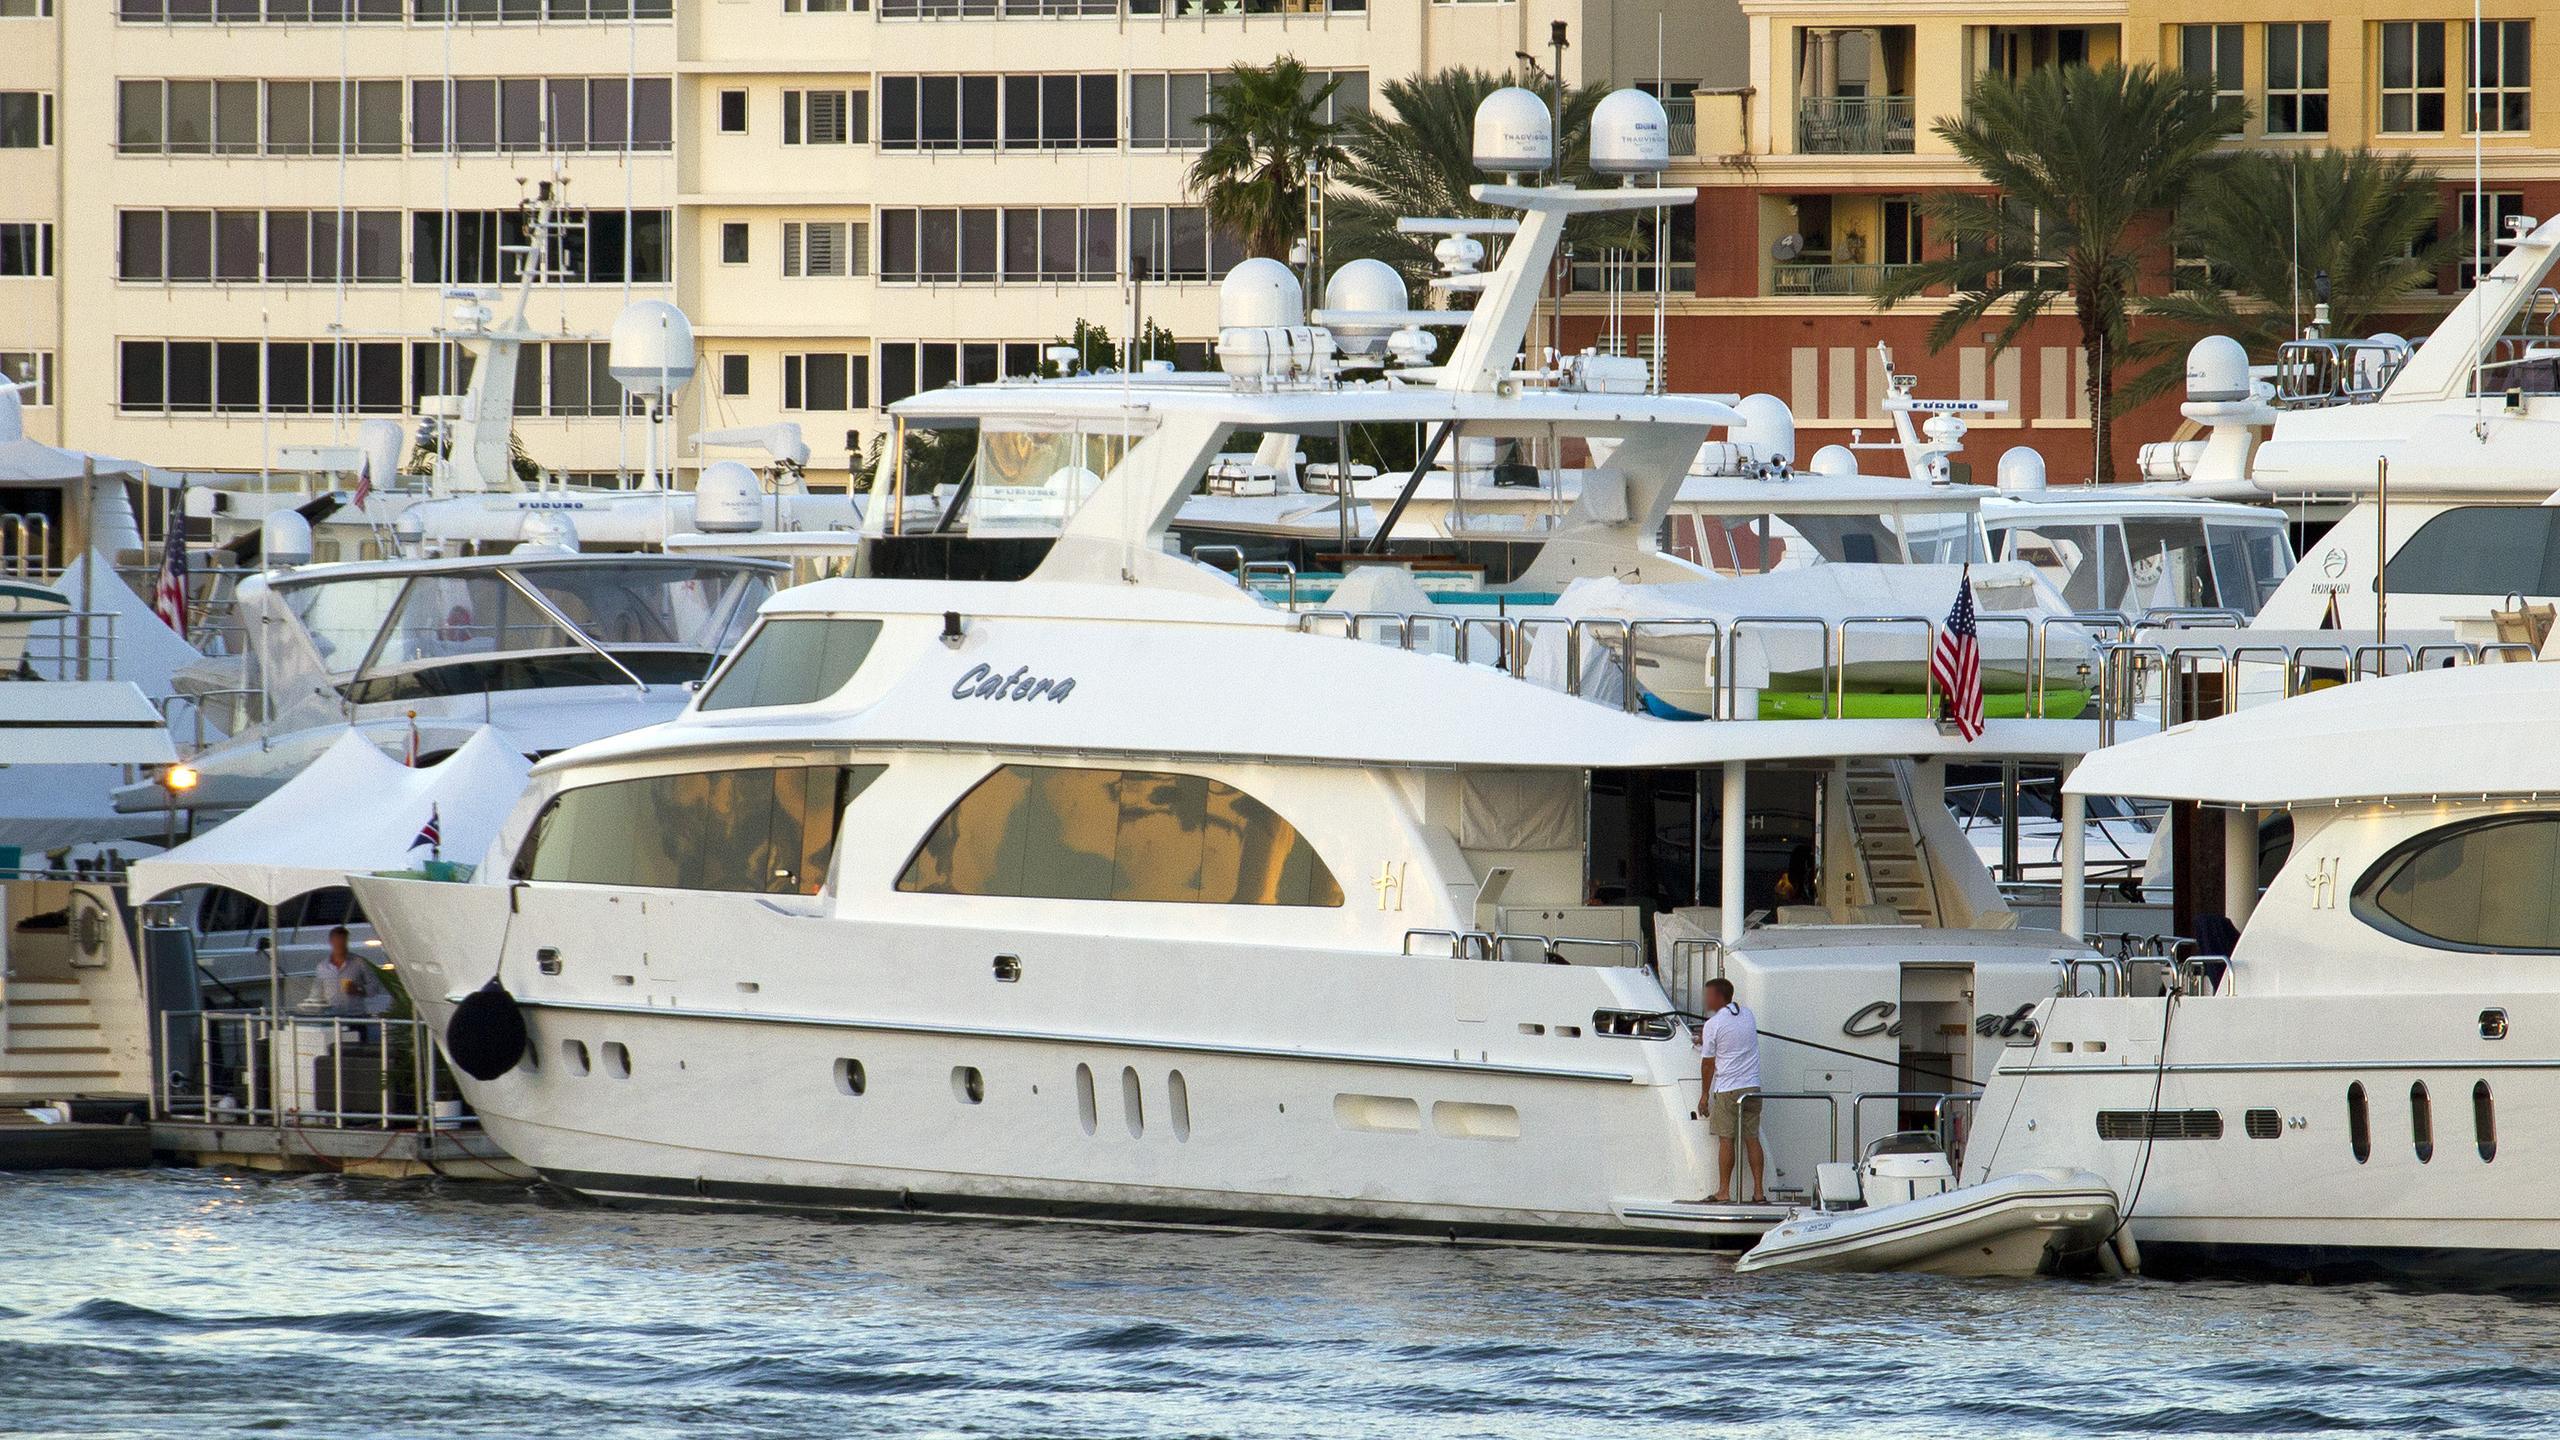 cynderella catera motoryacht hargrave 101 2010 30m half stern